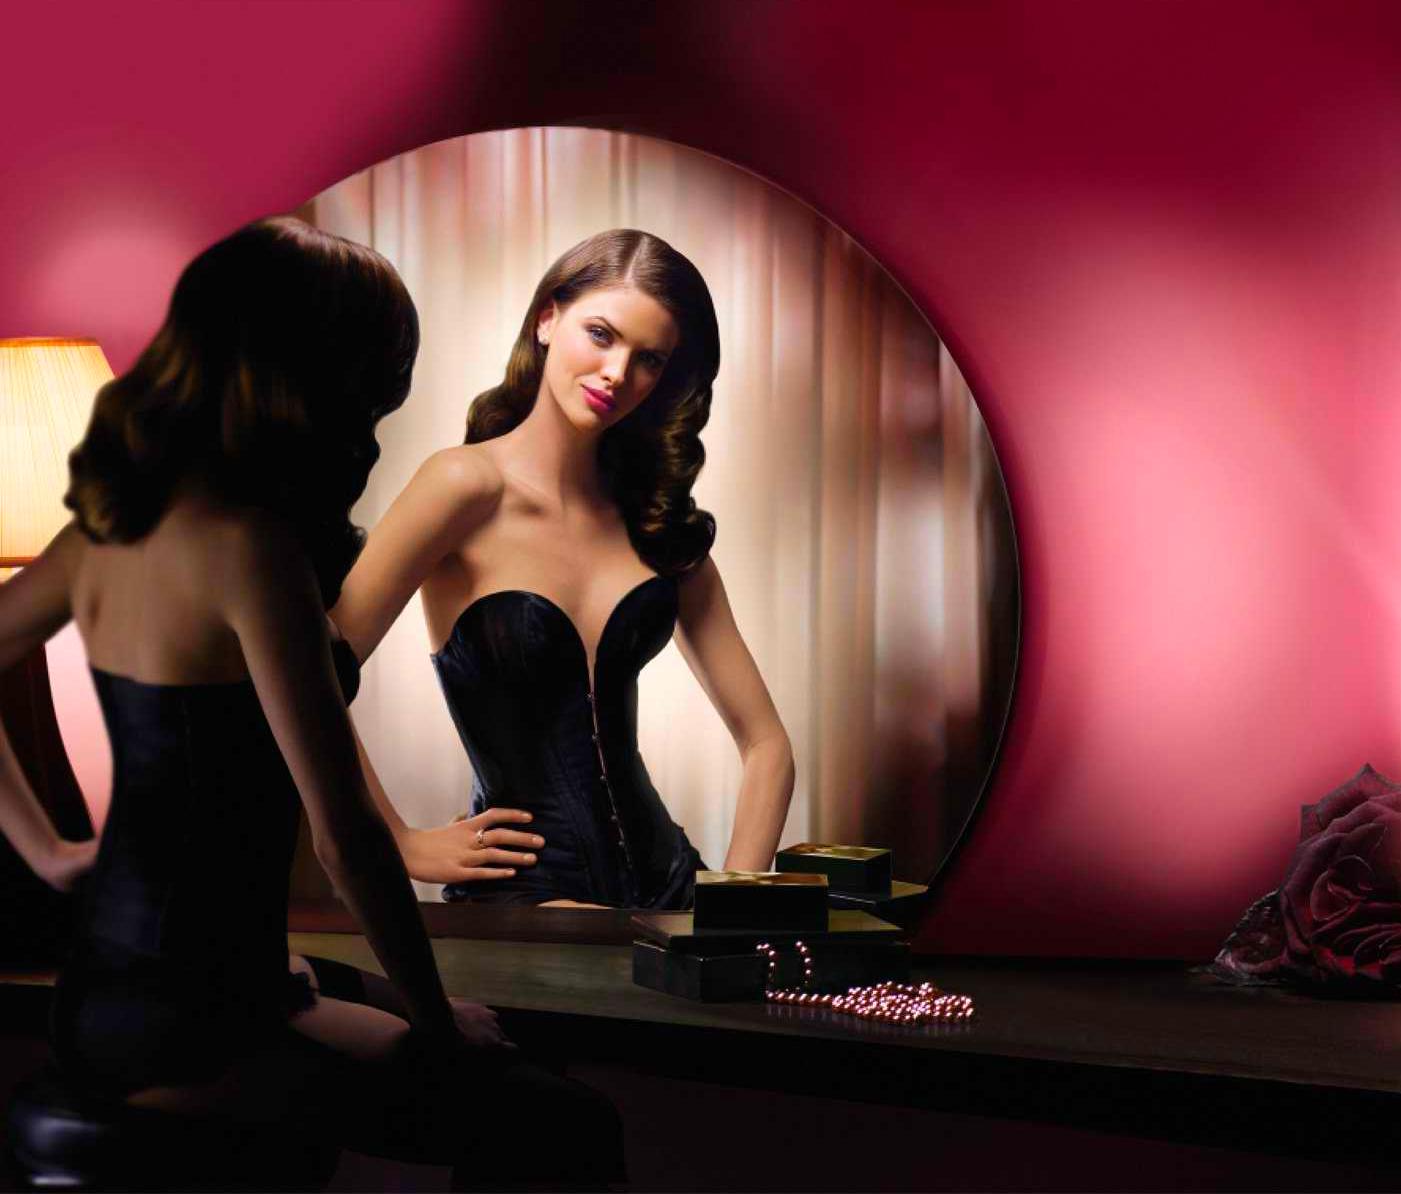 Наш секс через зеркало